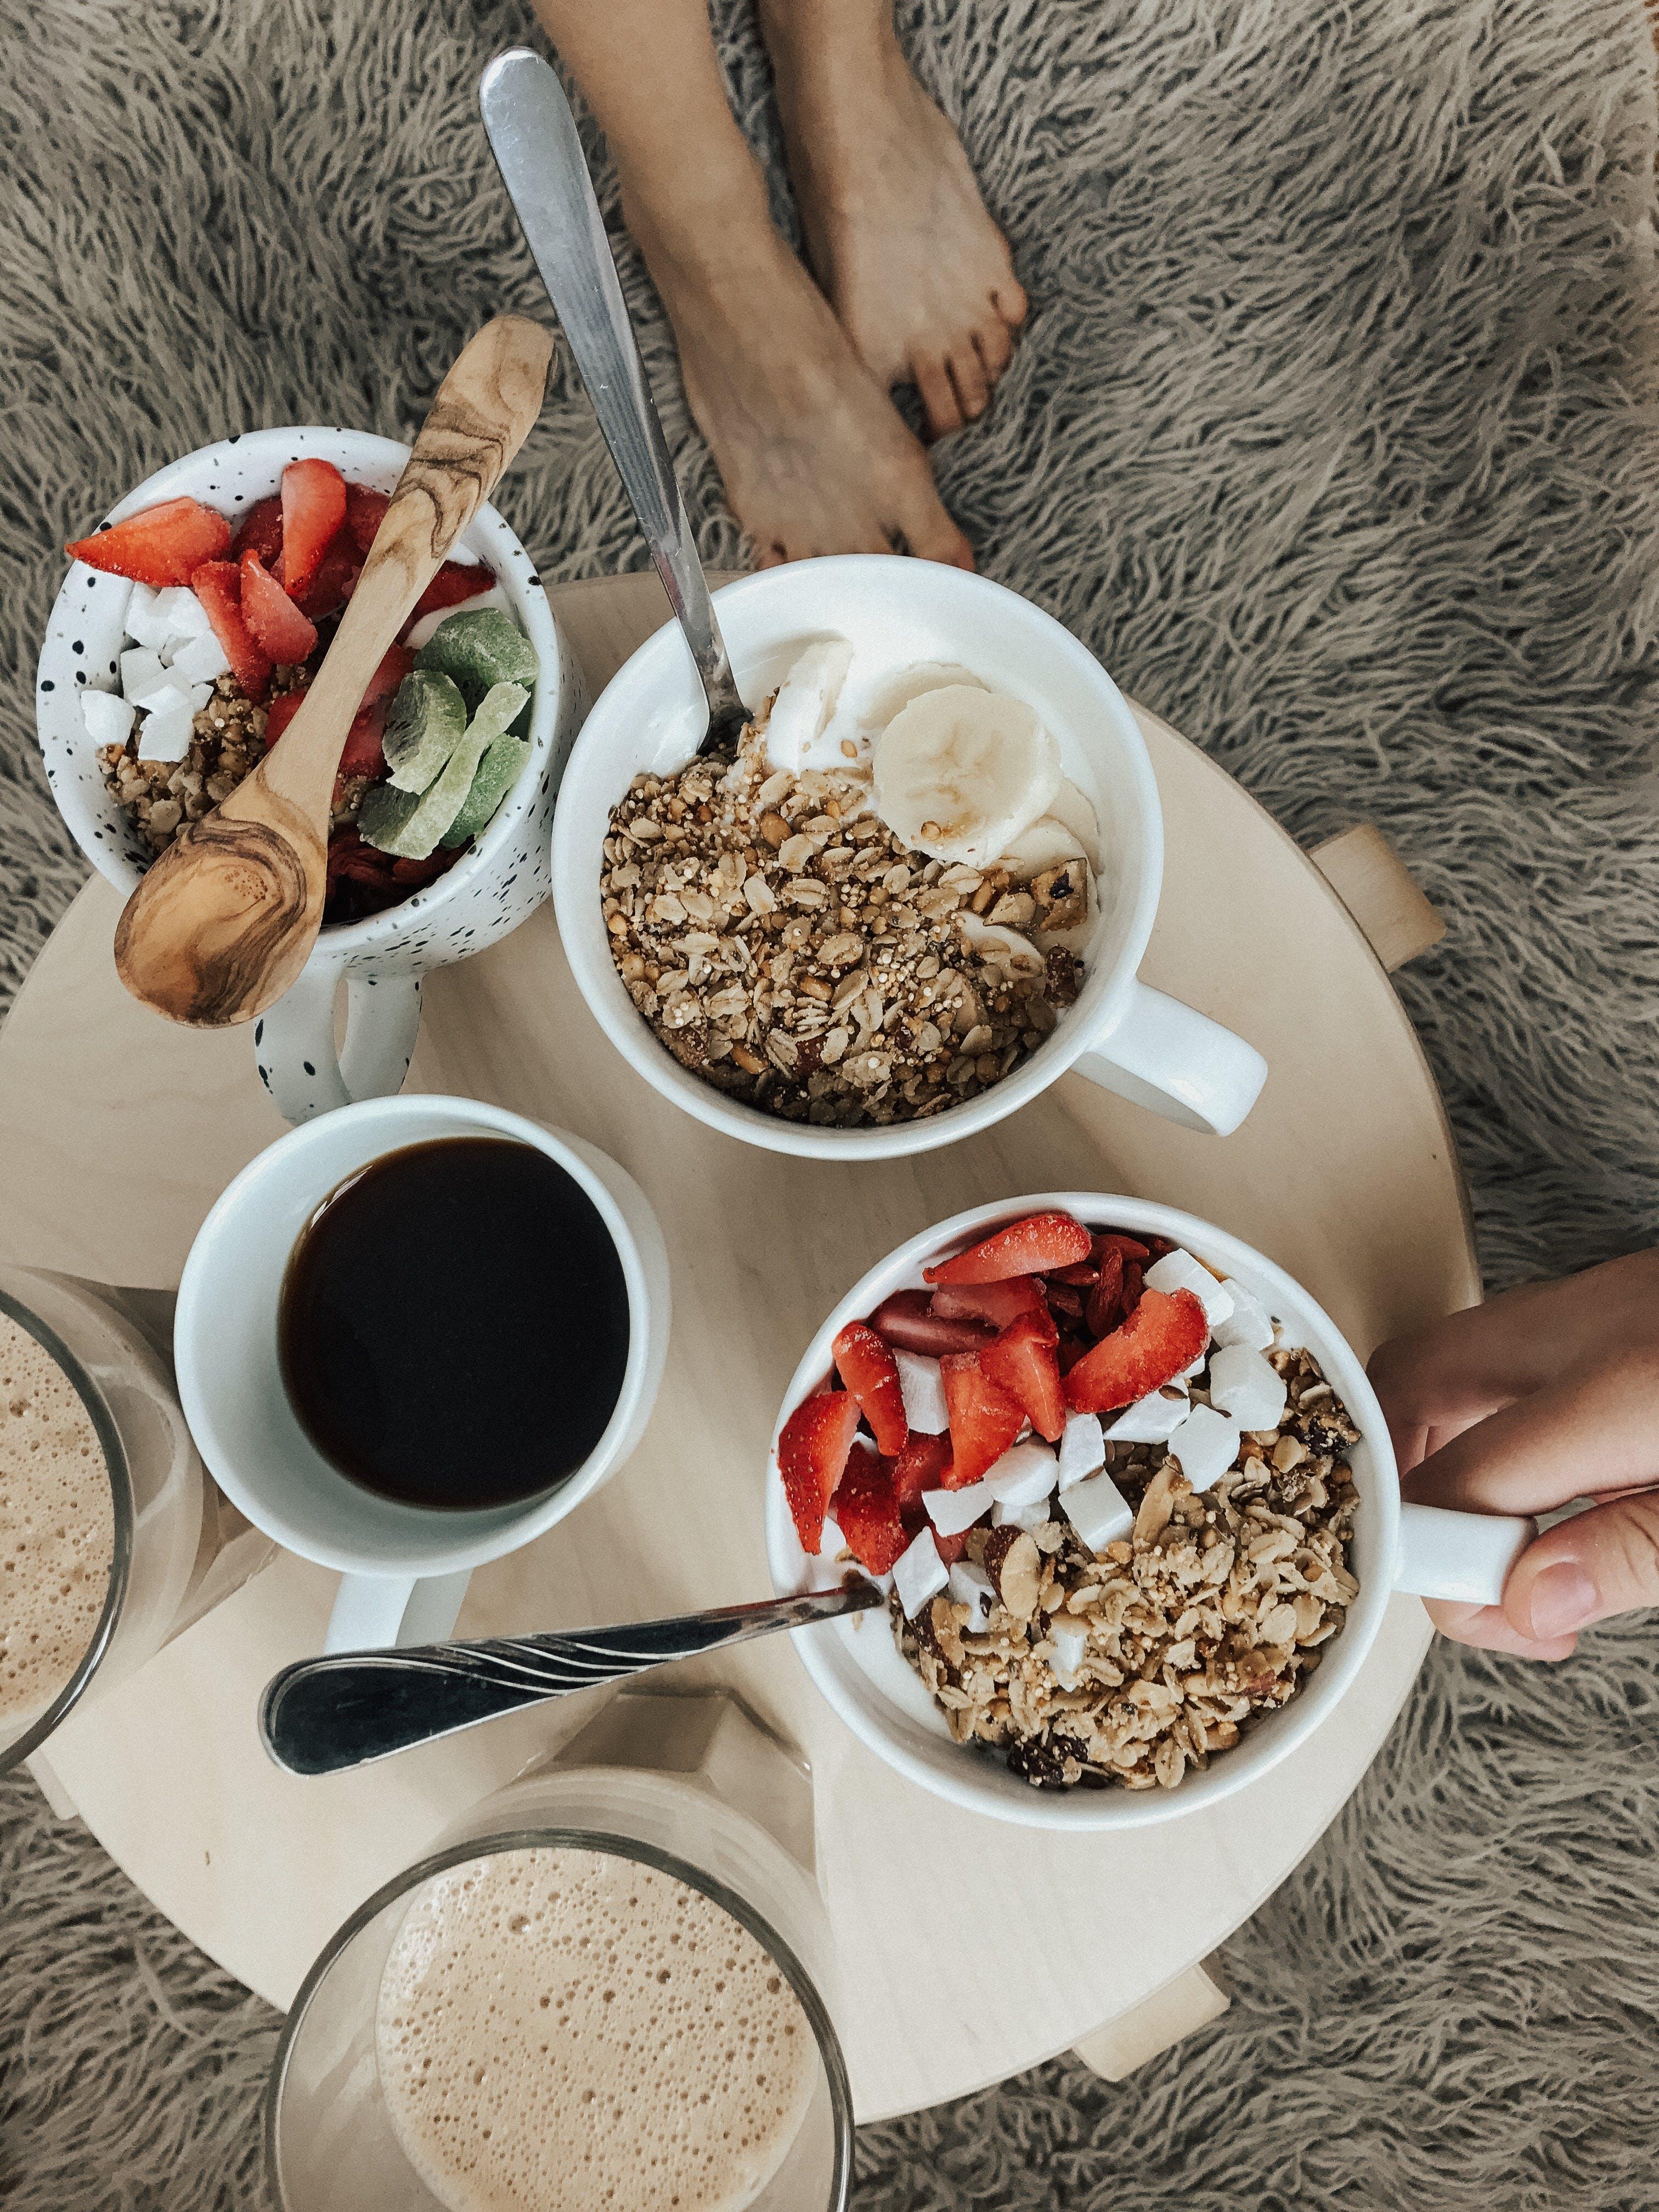 Flatlay Photography Of Food